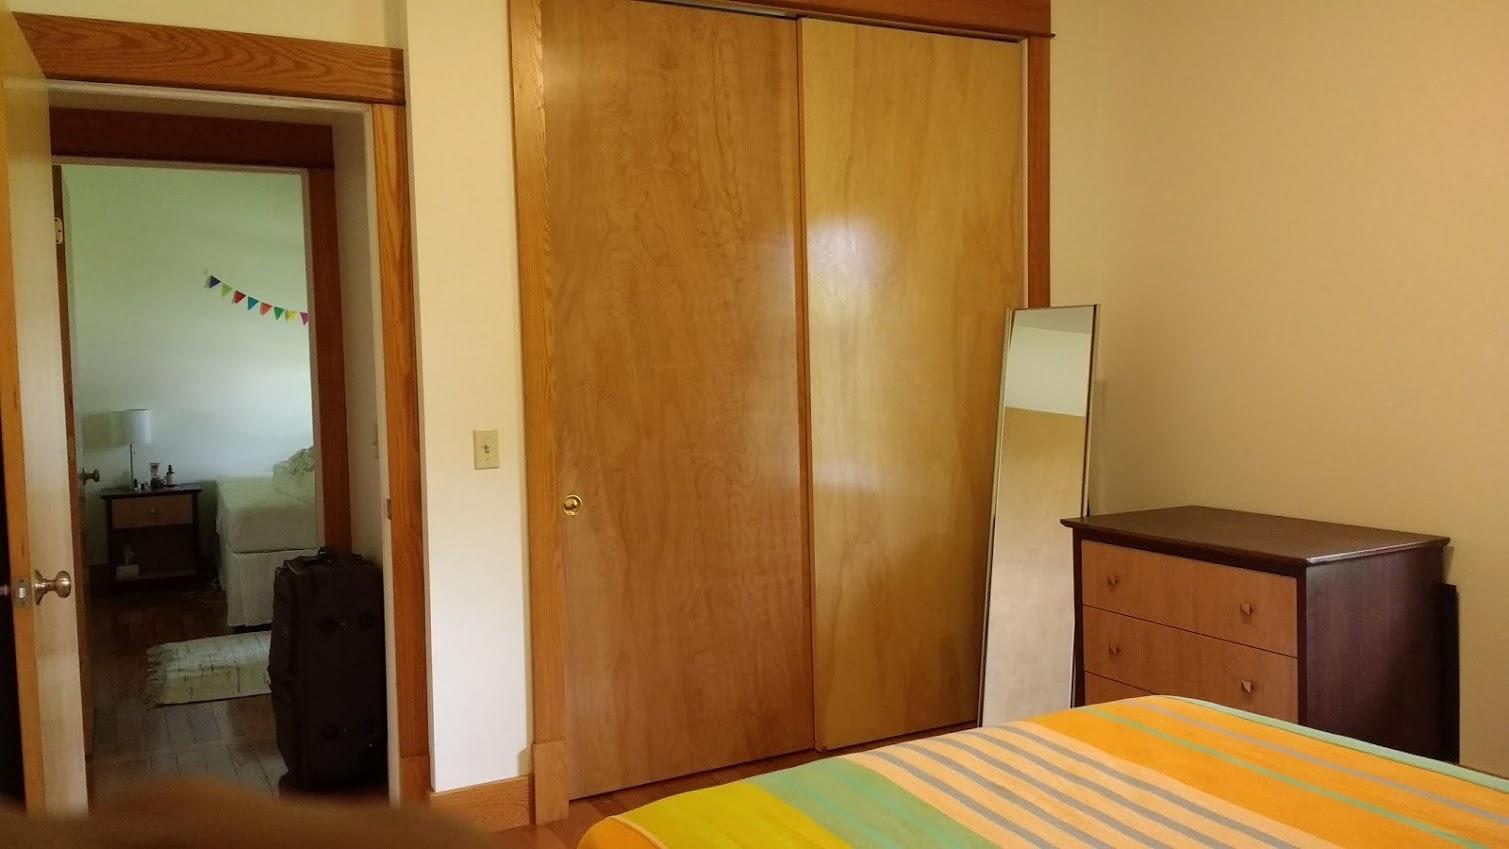 143 Maple Ave, Ithaca, NY 14850 - 1 Bed, 1 Bath - 5 Photos